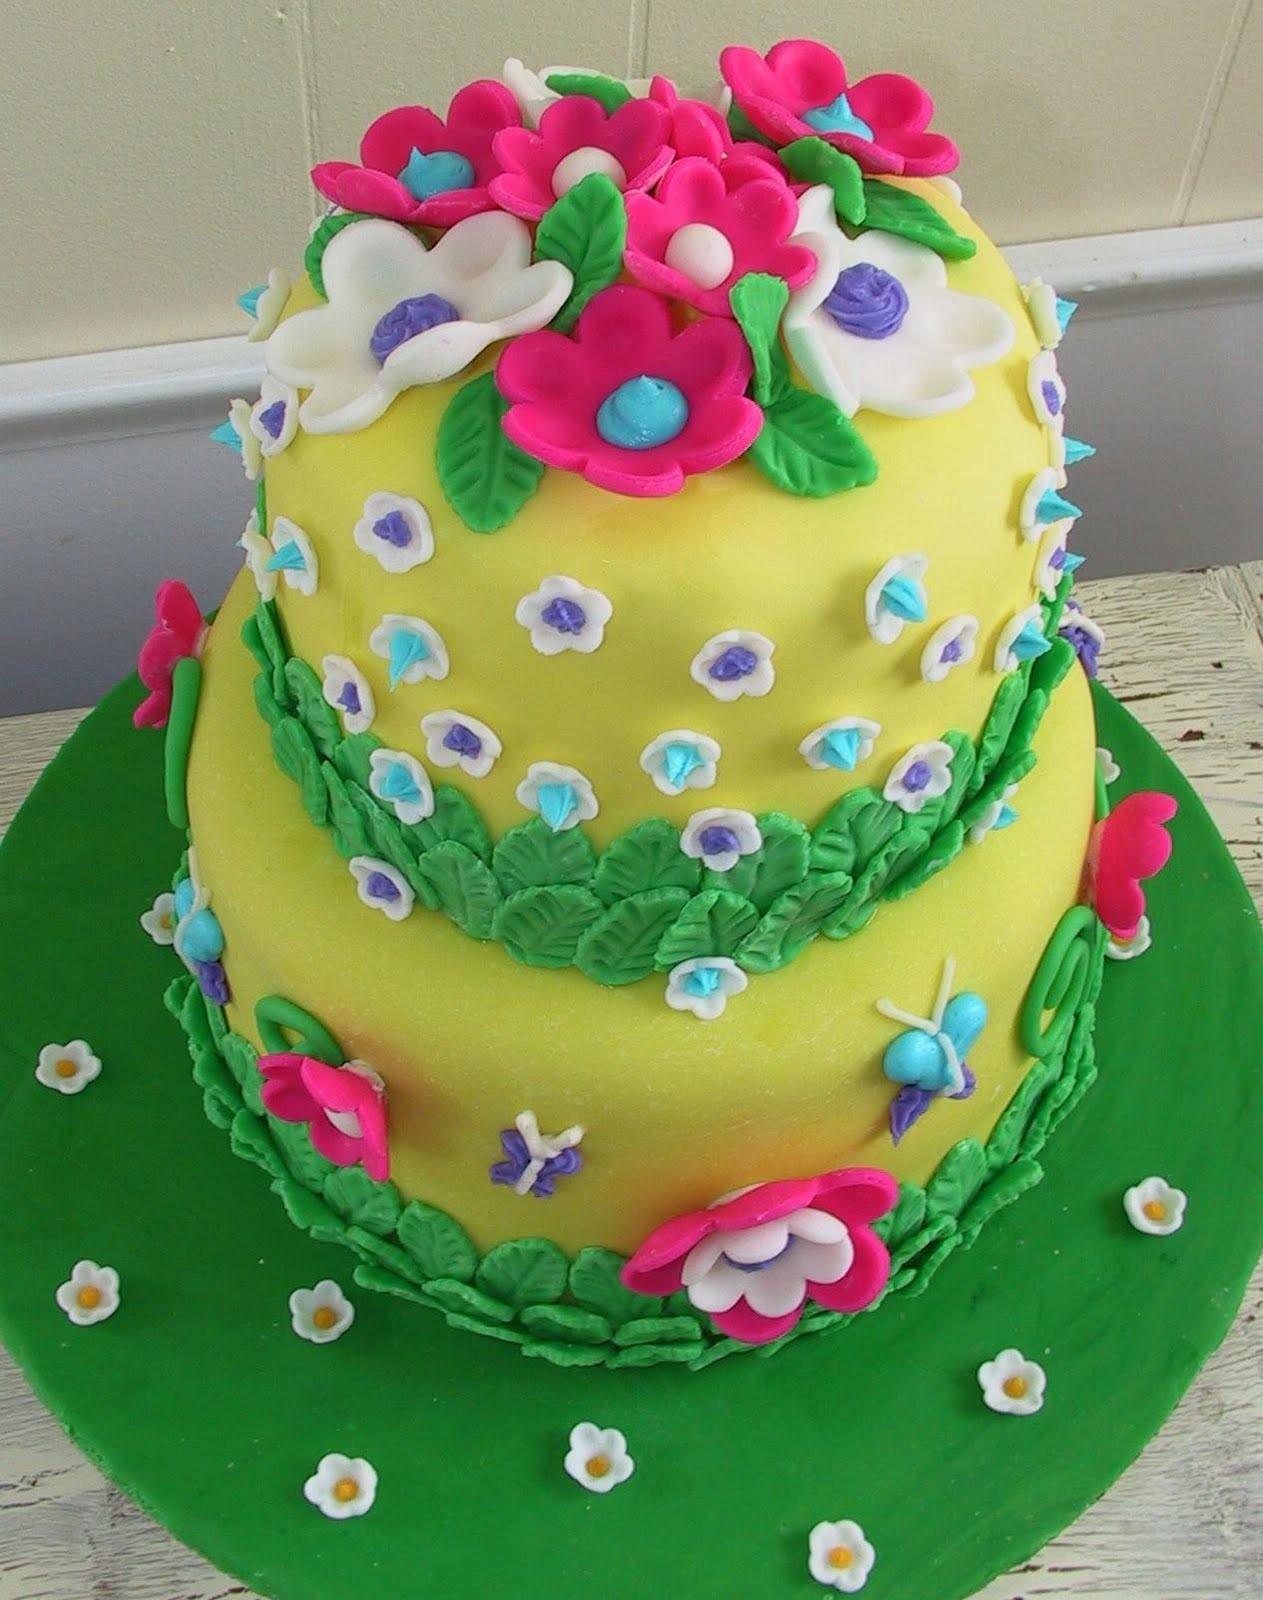 Funny Birthday Cakes Images  Birthday cake image image of birthday cake funny